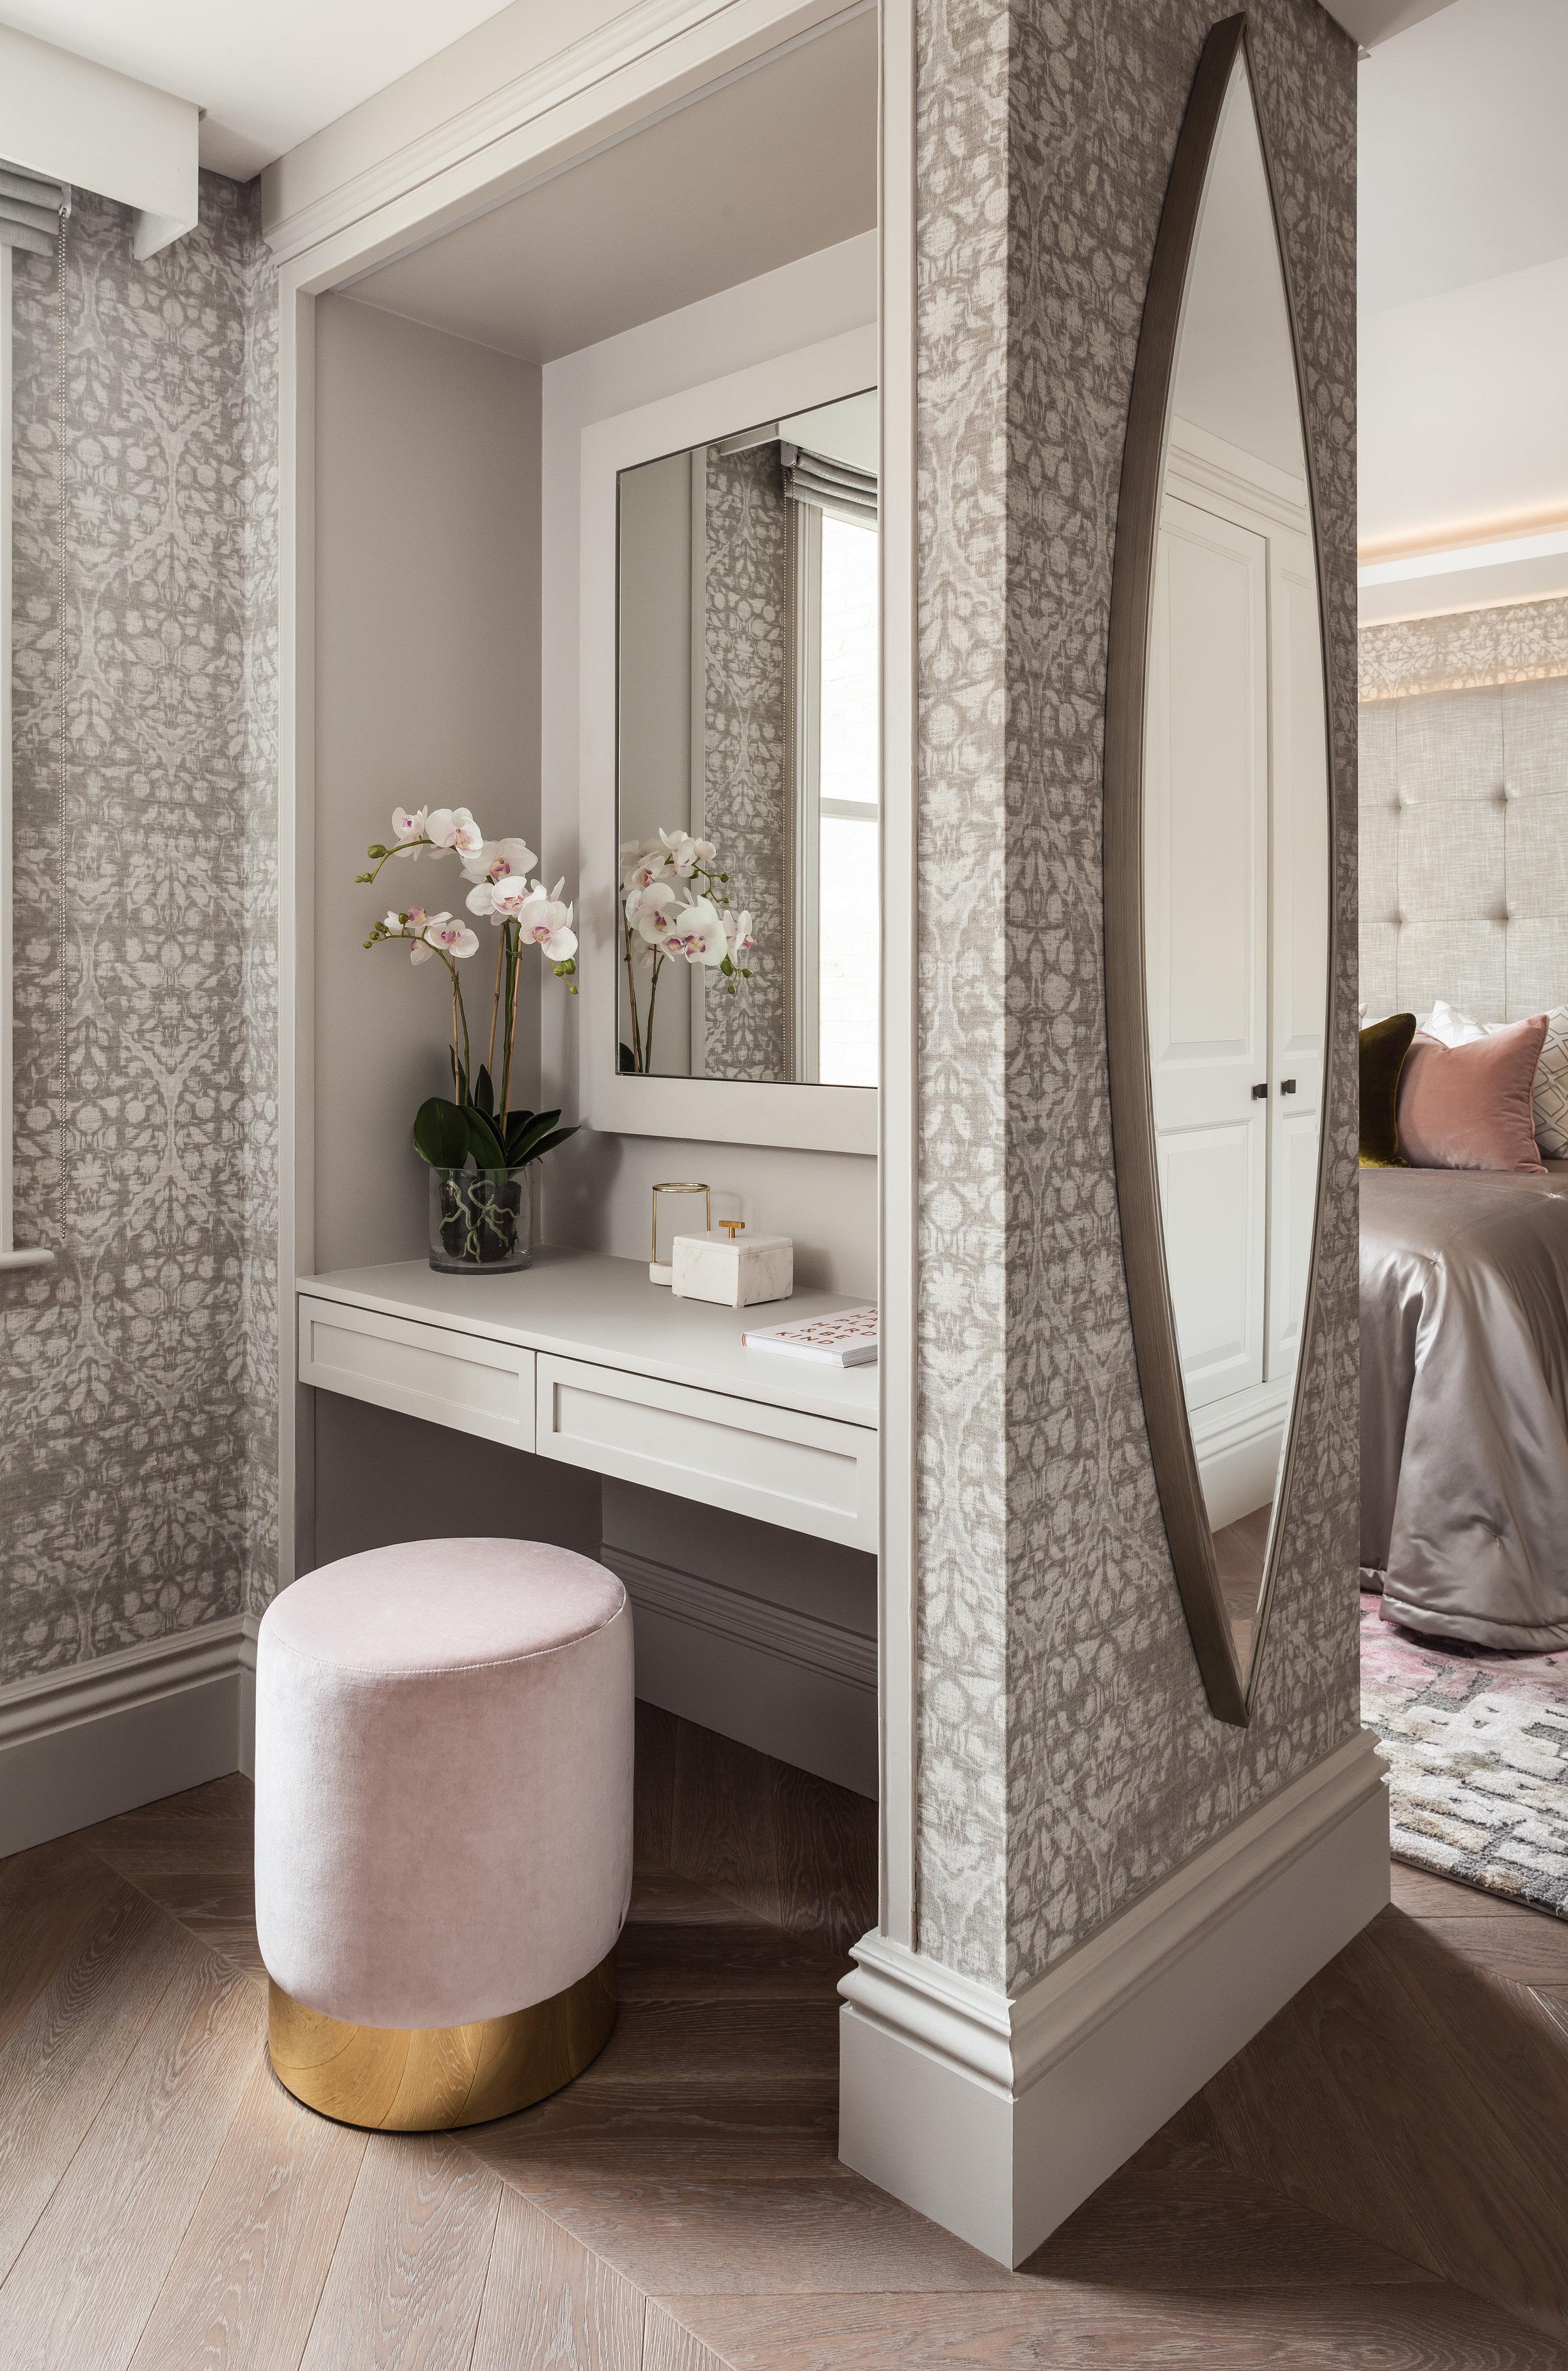 Jo Hamilton Interiors - Kensington bedroom dressing area